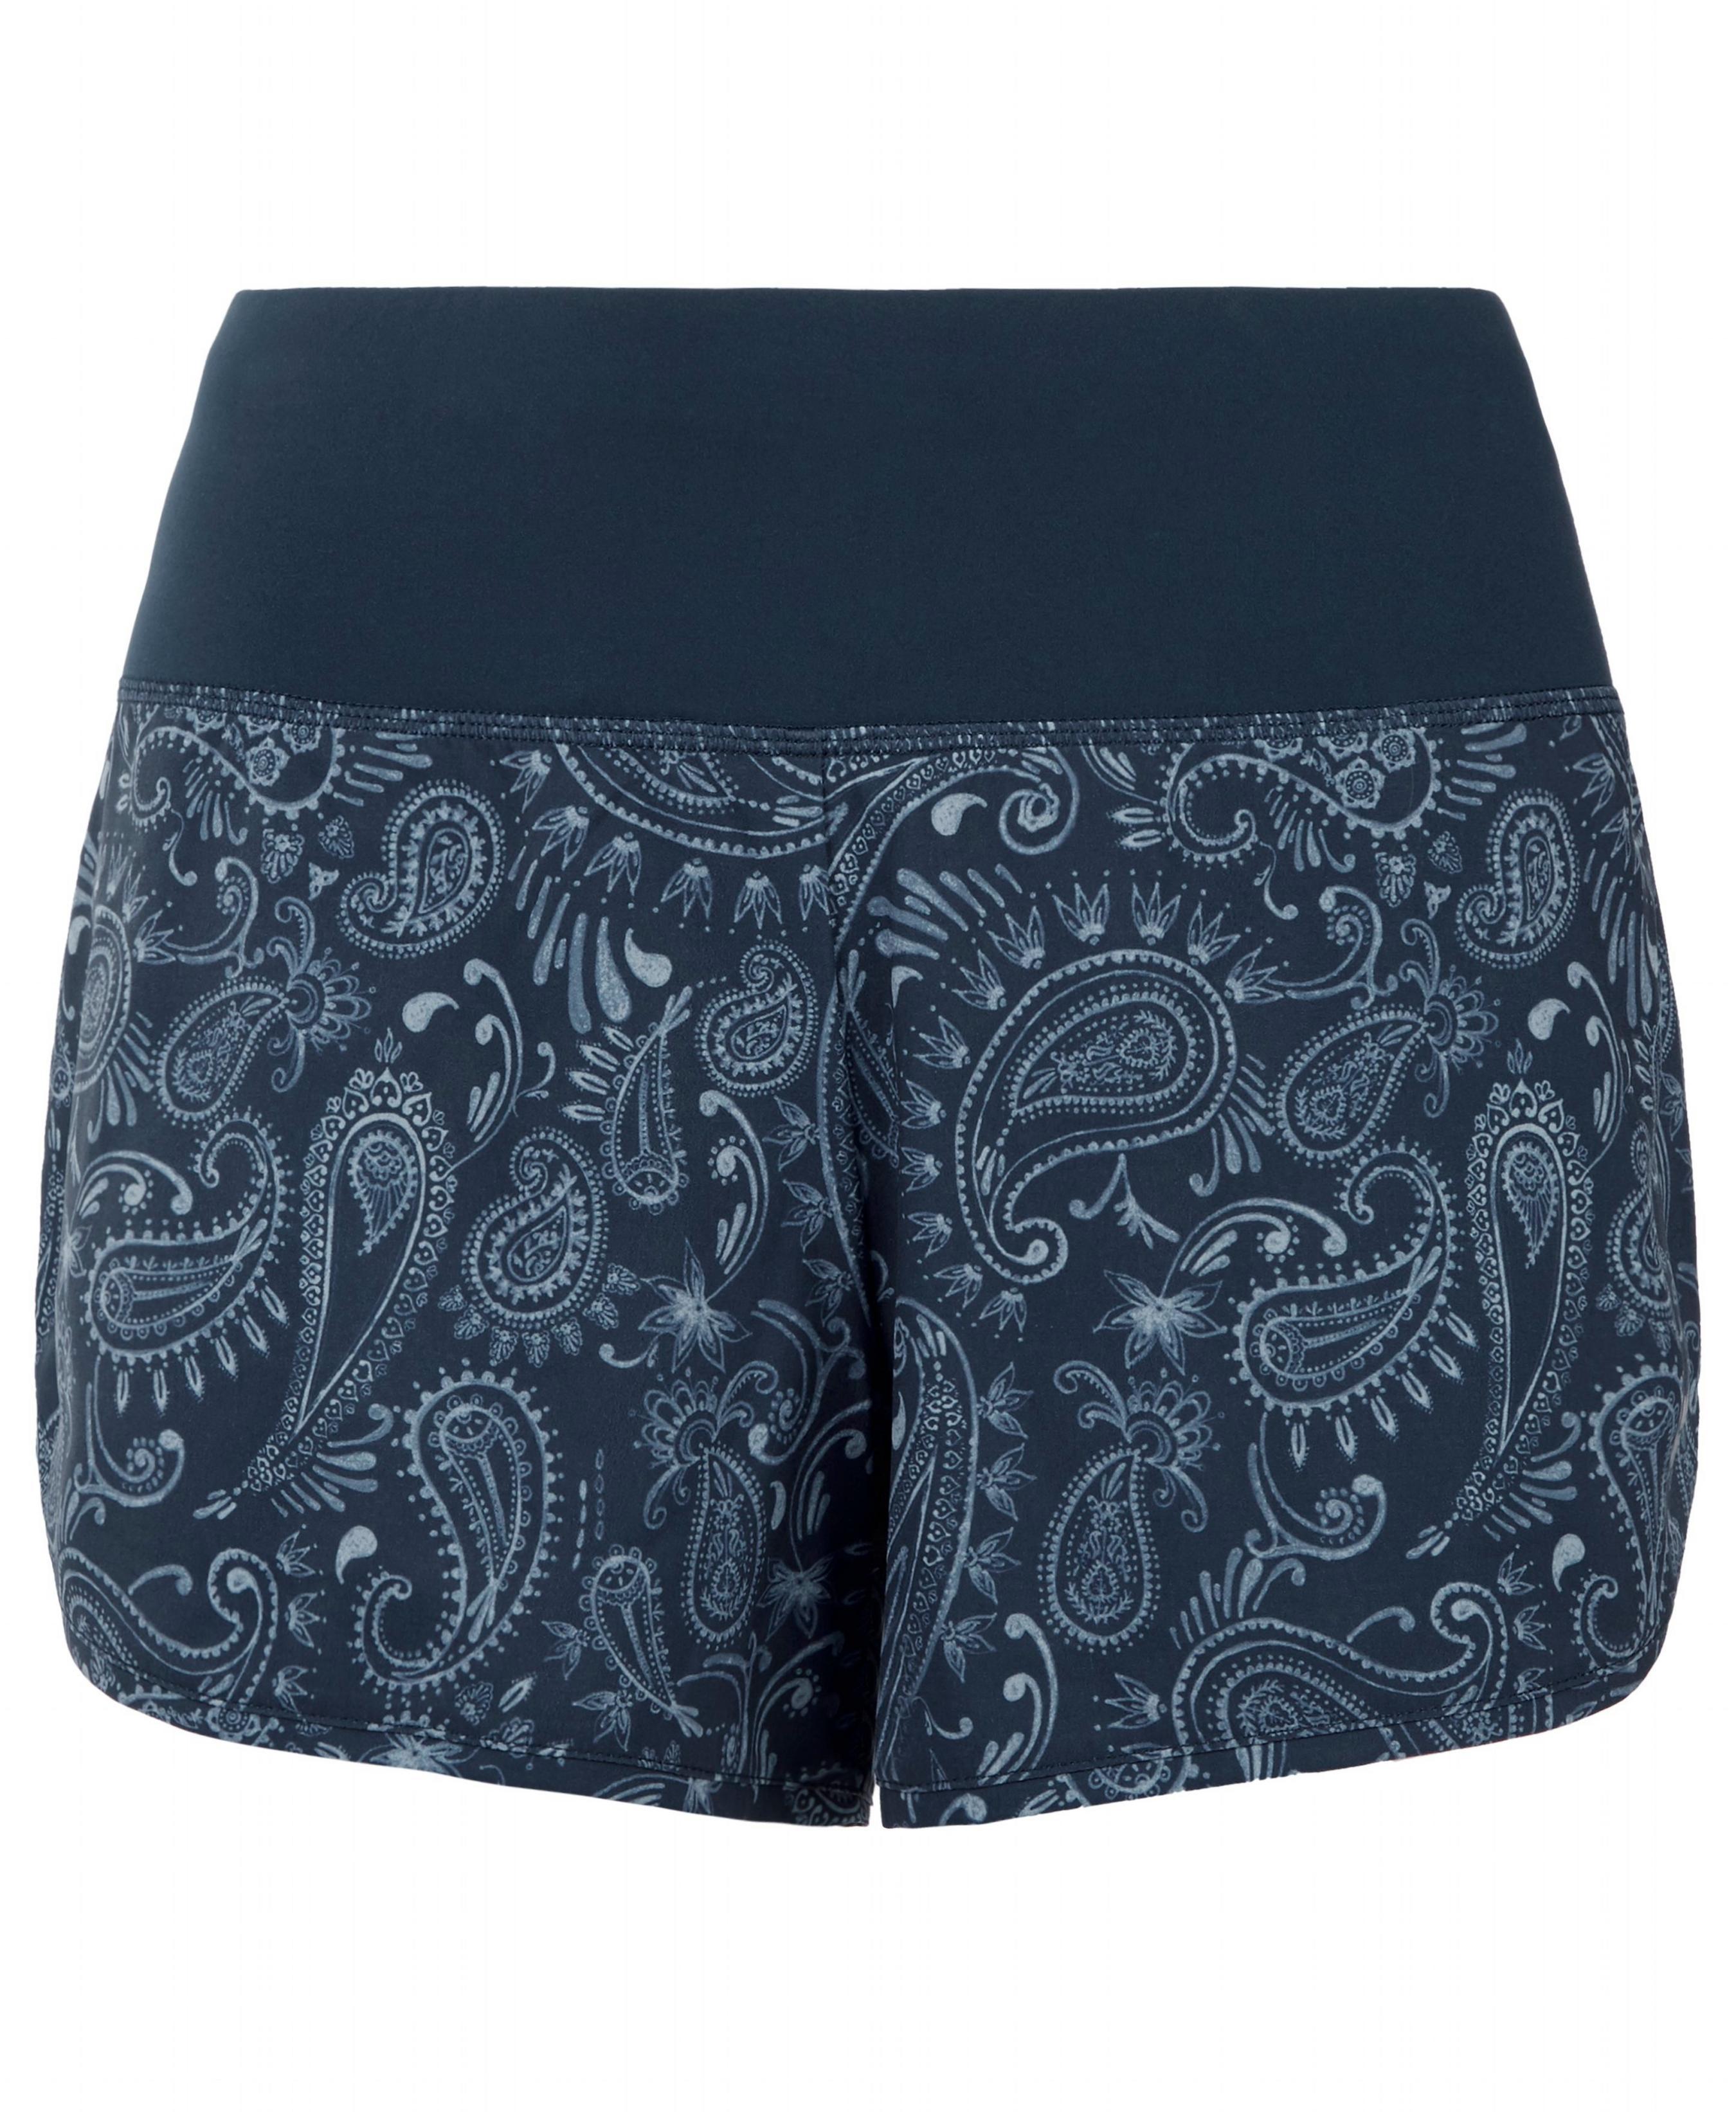 sweaty betty sale - cheap running shorts